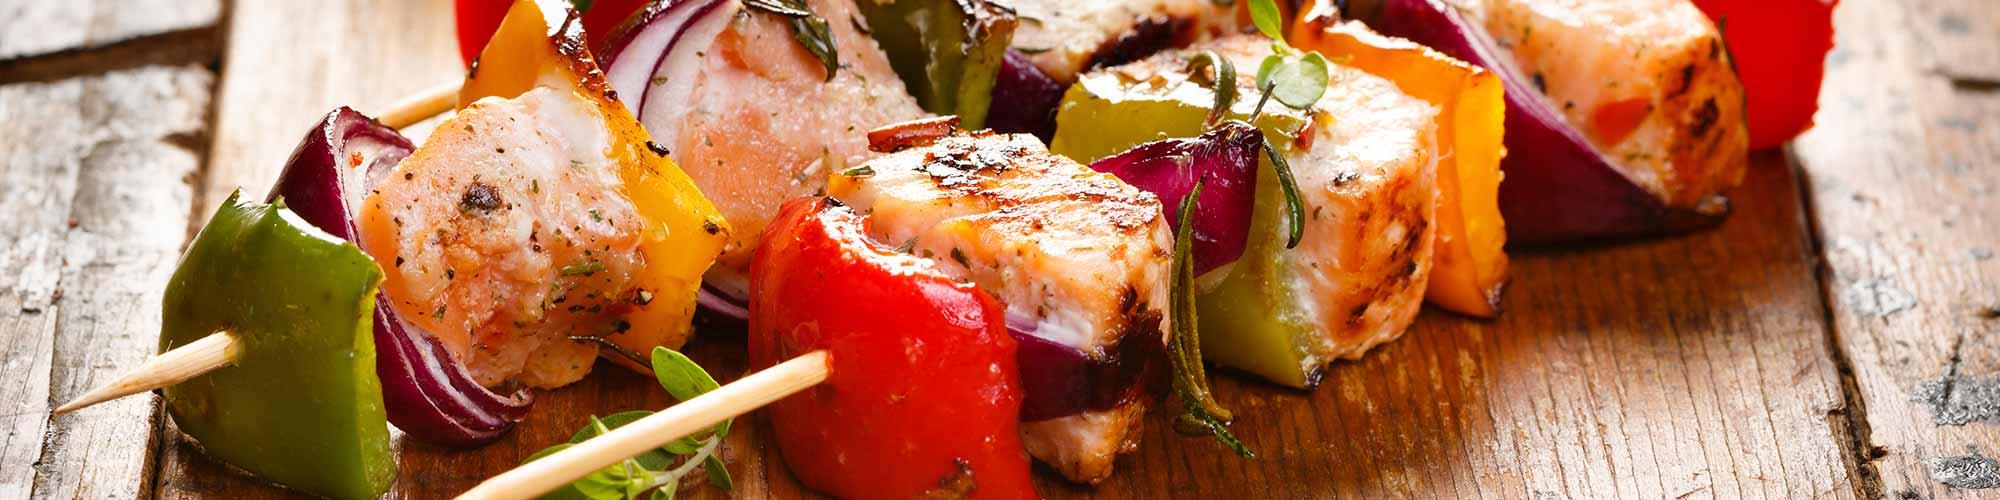 Navarra gastronómica  - EL PAIS Viajes